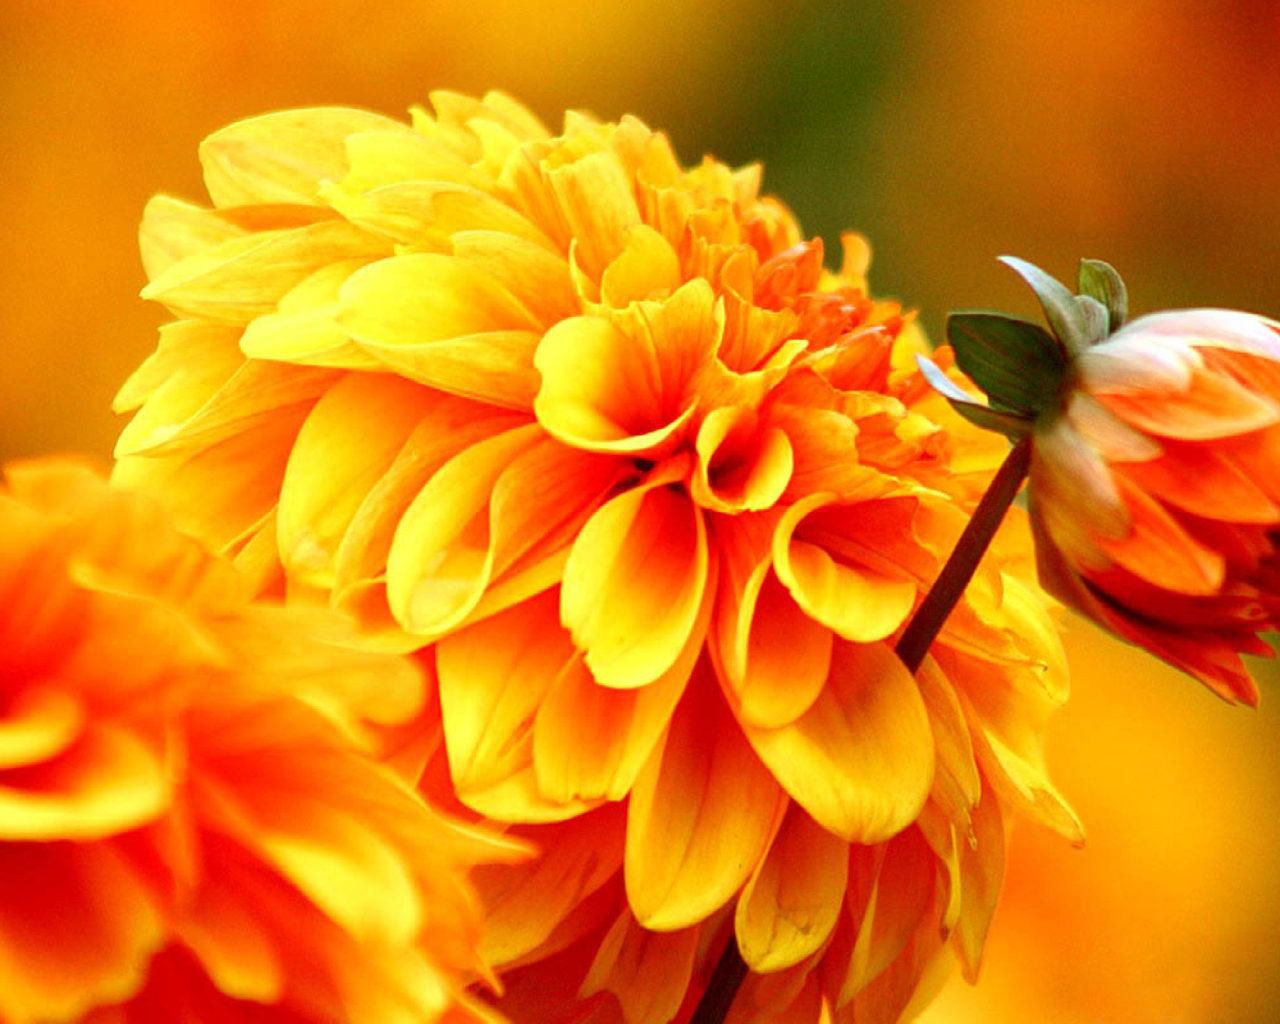 Fall Daisy Wallpaper Orange Dahlia Autumn Flowers Wallpapers Wallpapers13 Com